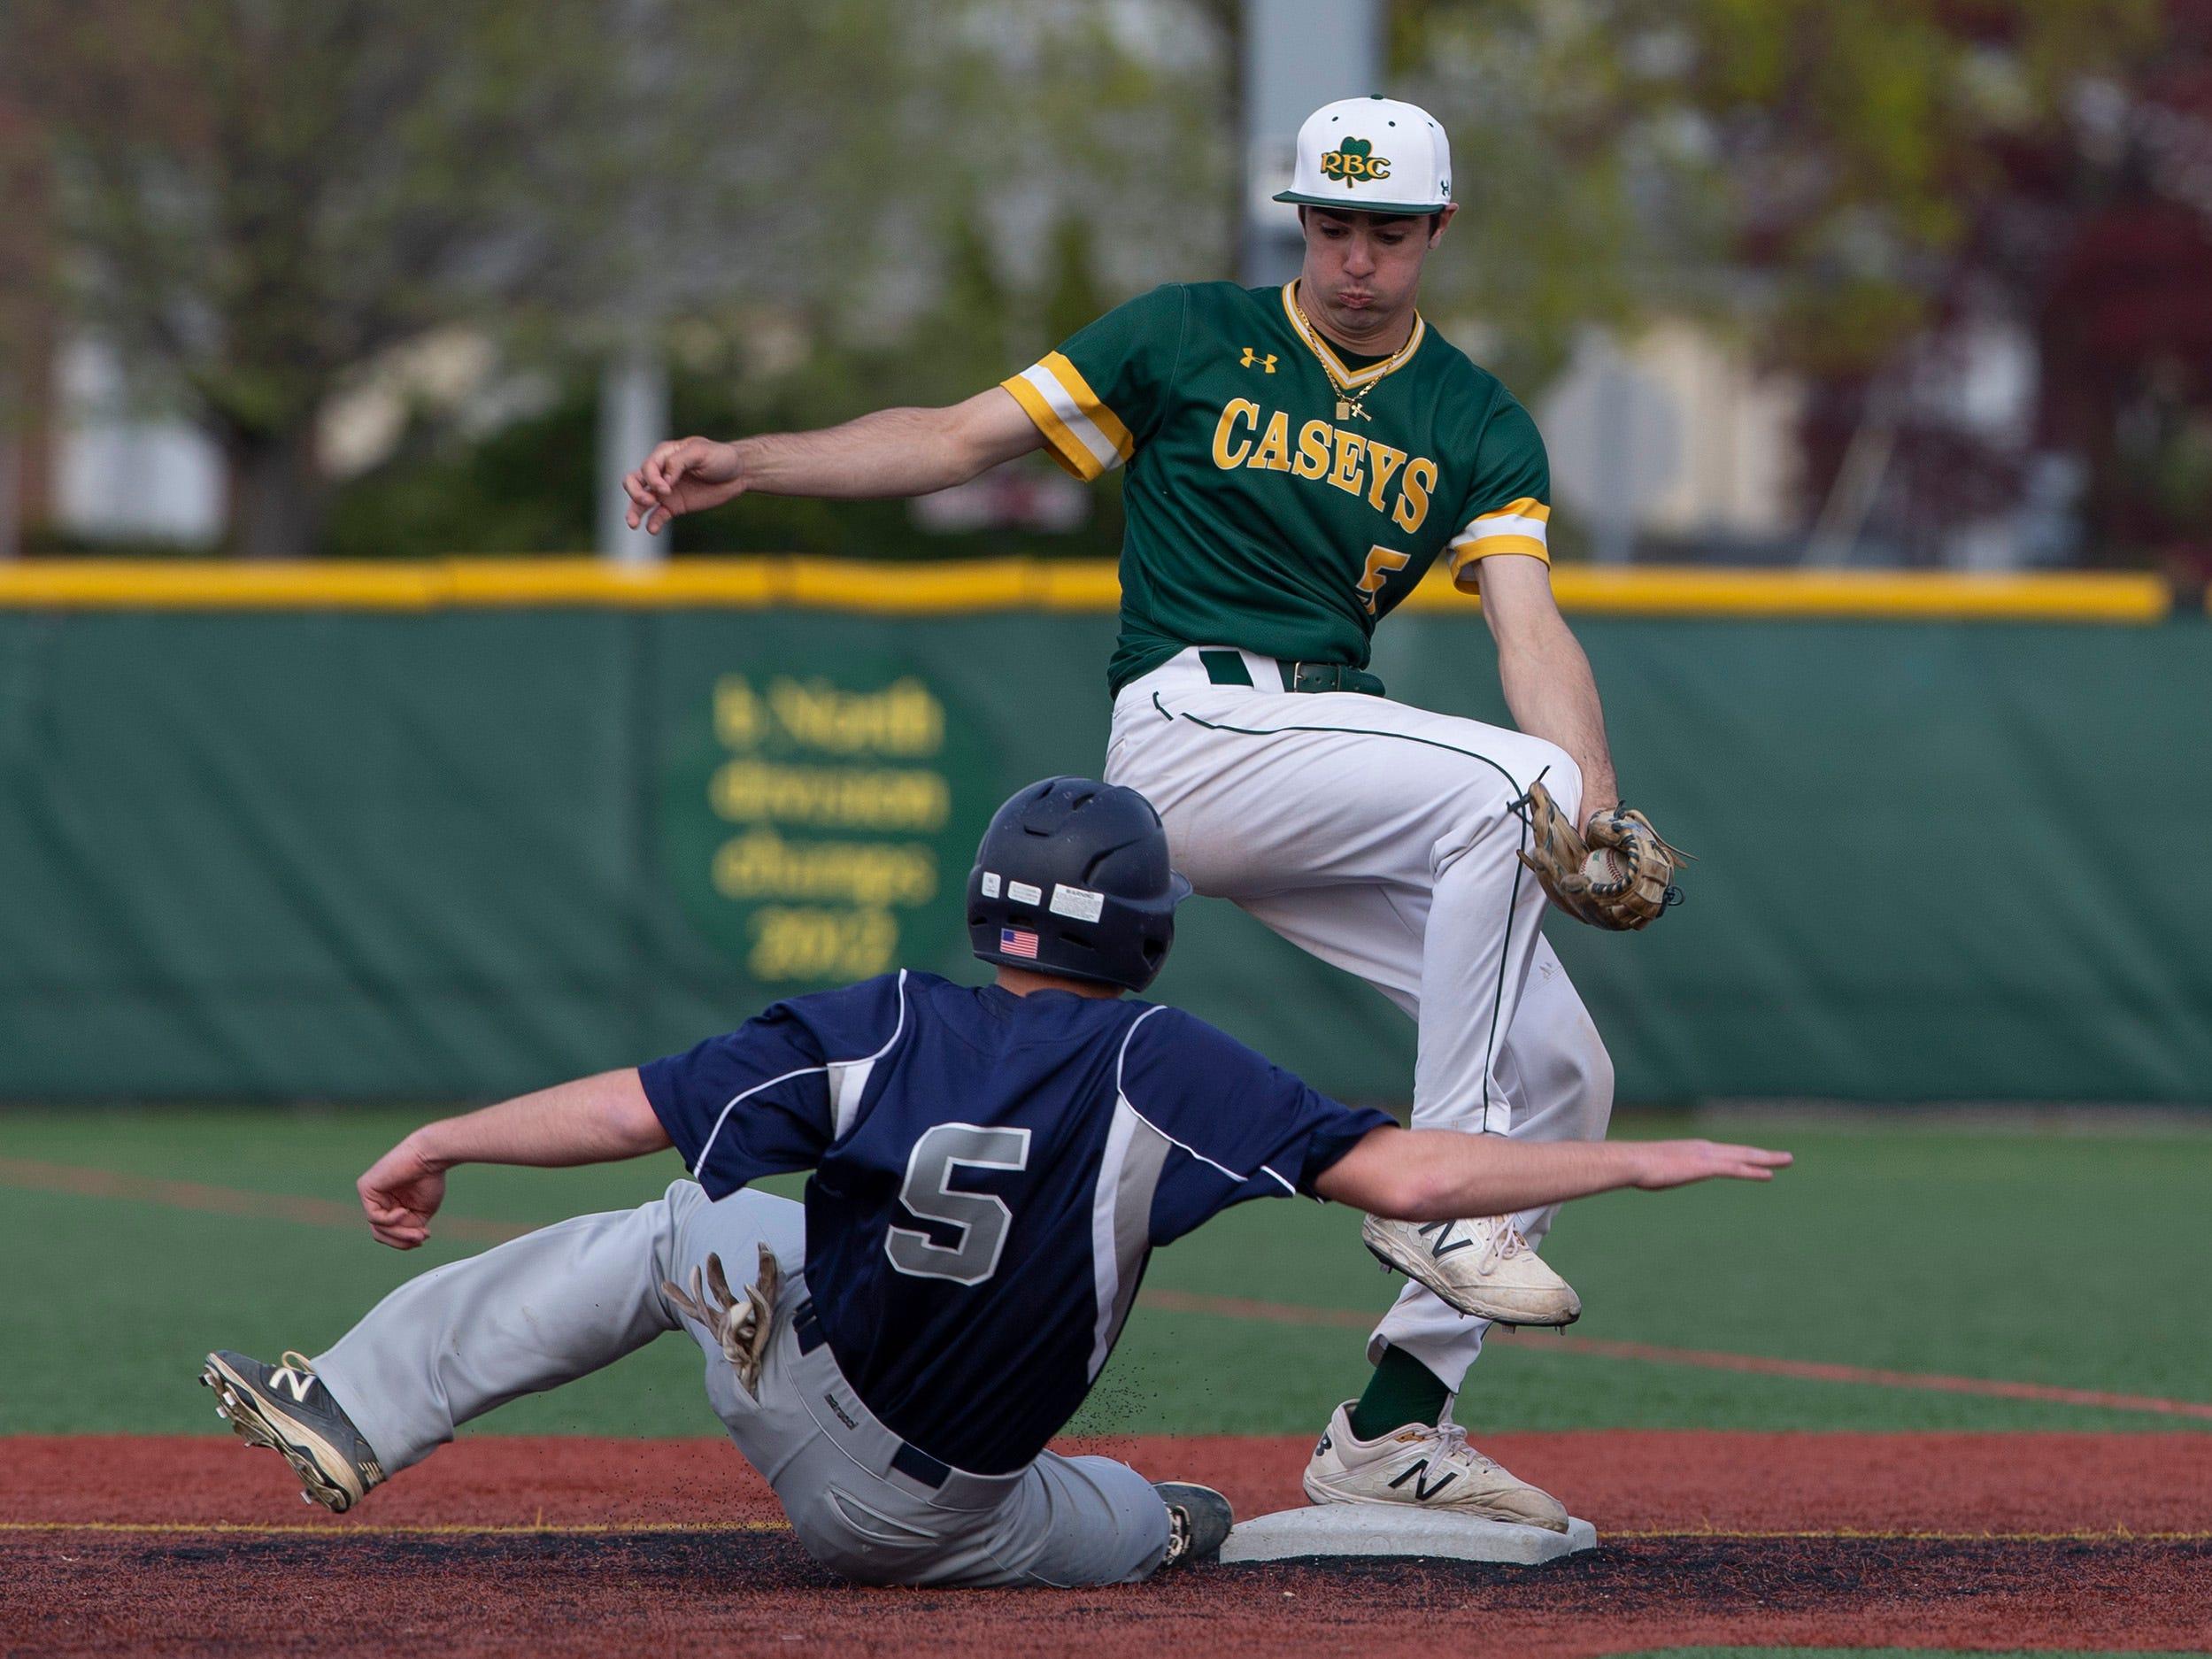 Manasquan baseball vs Red Bank Catholic in Red Bank, NJ on April 18, 2019.